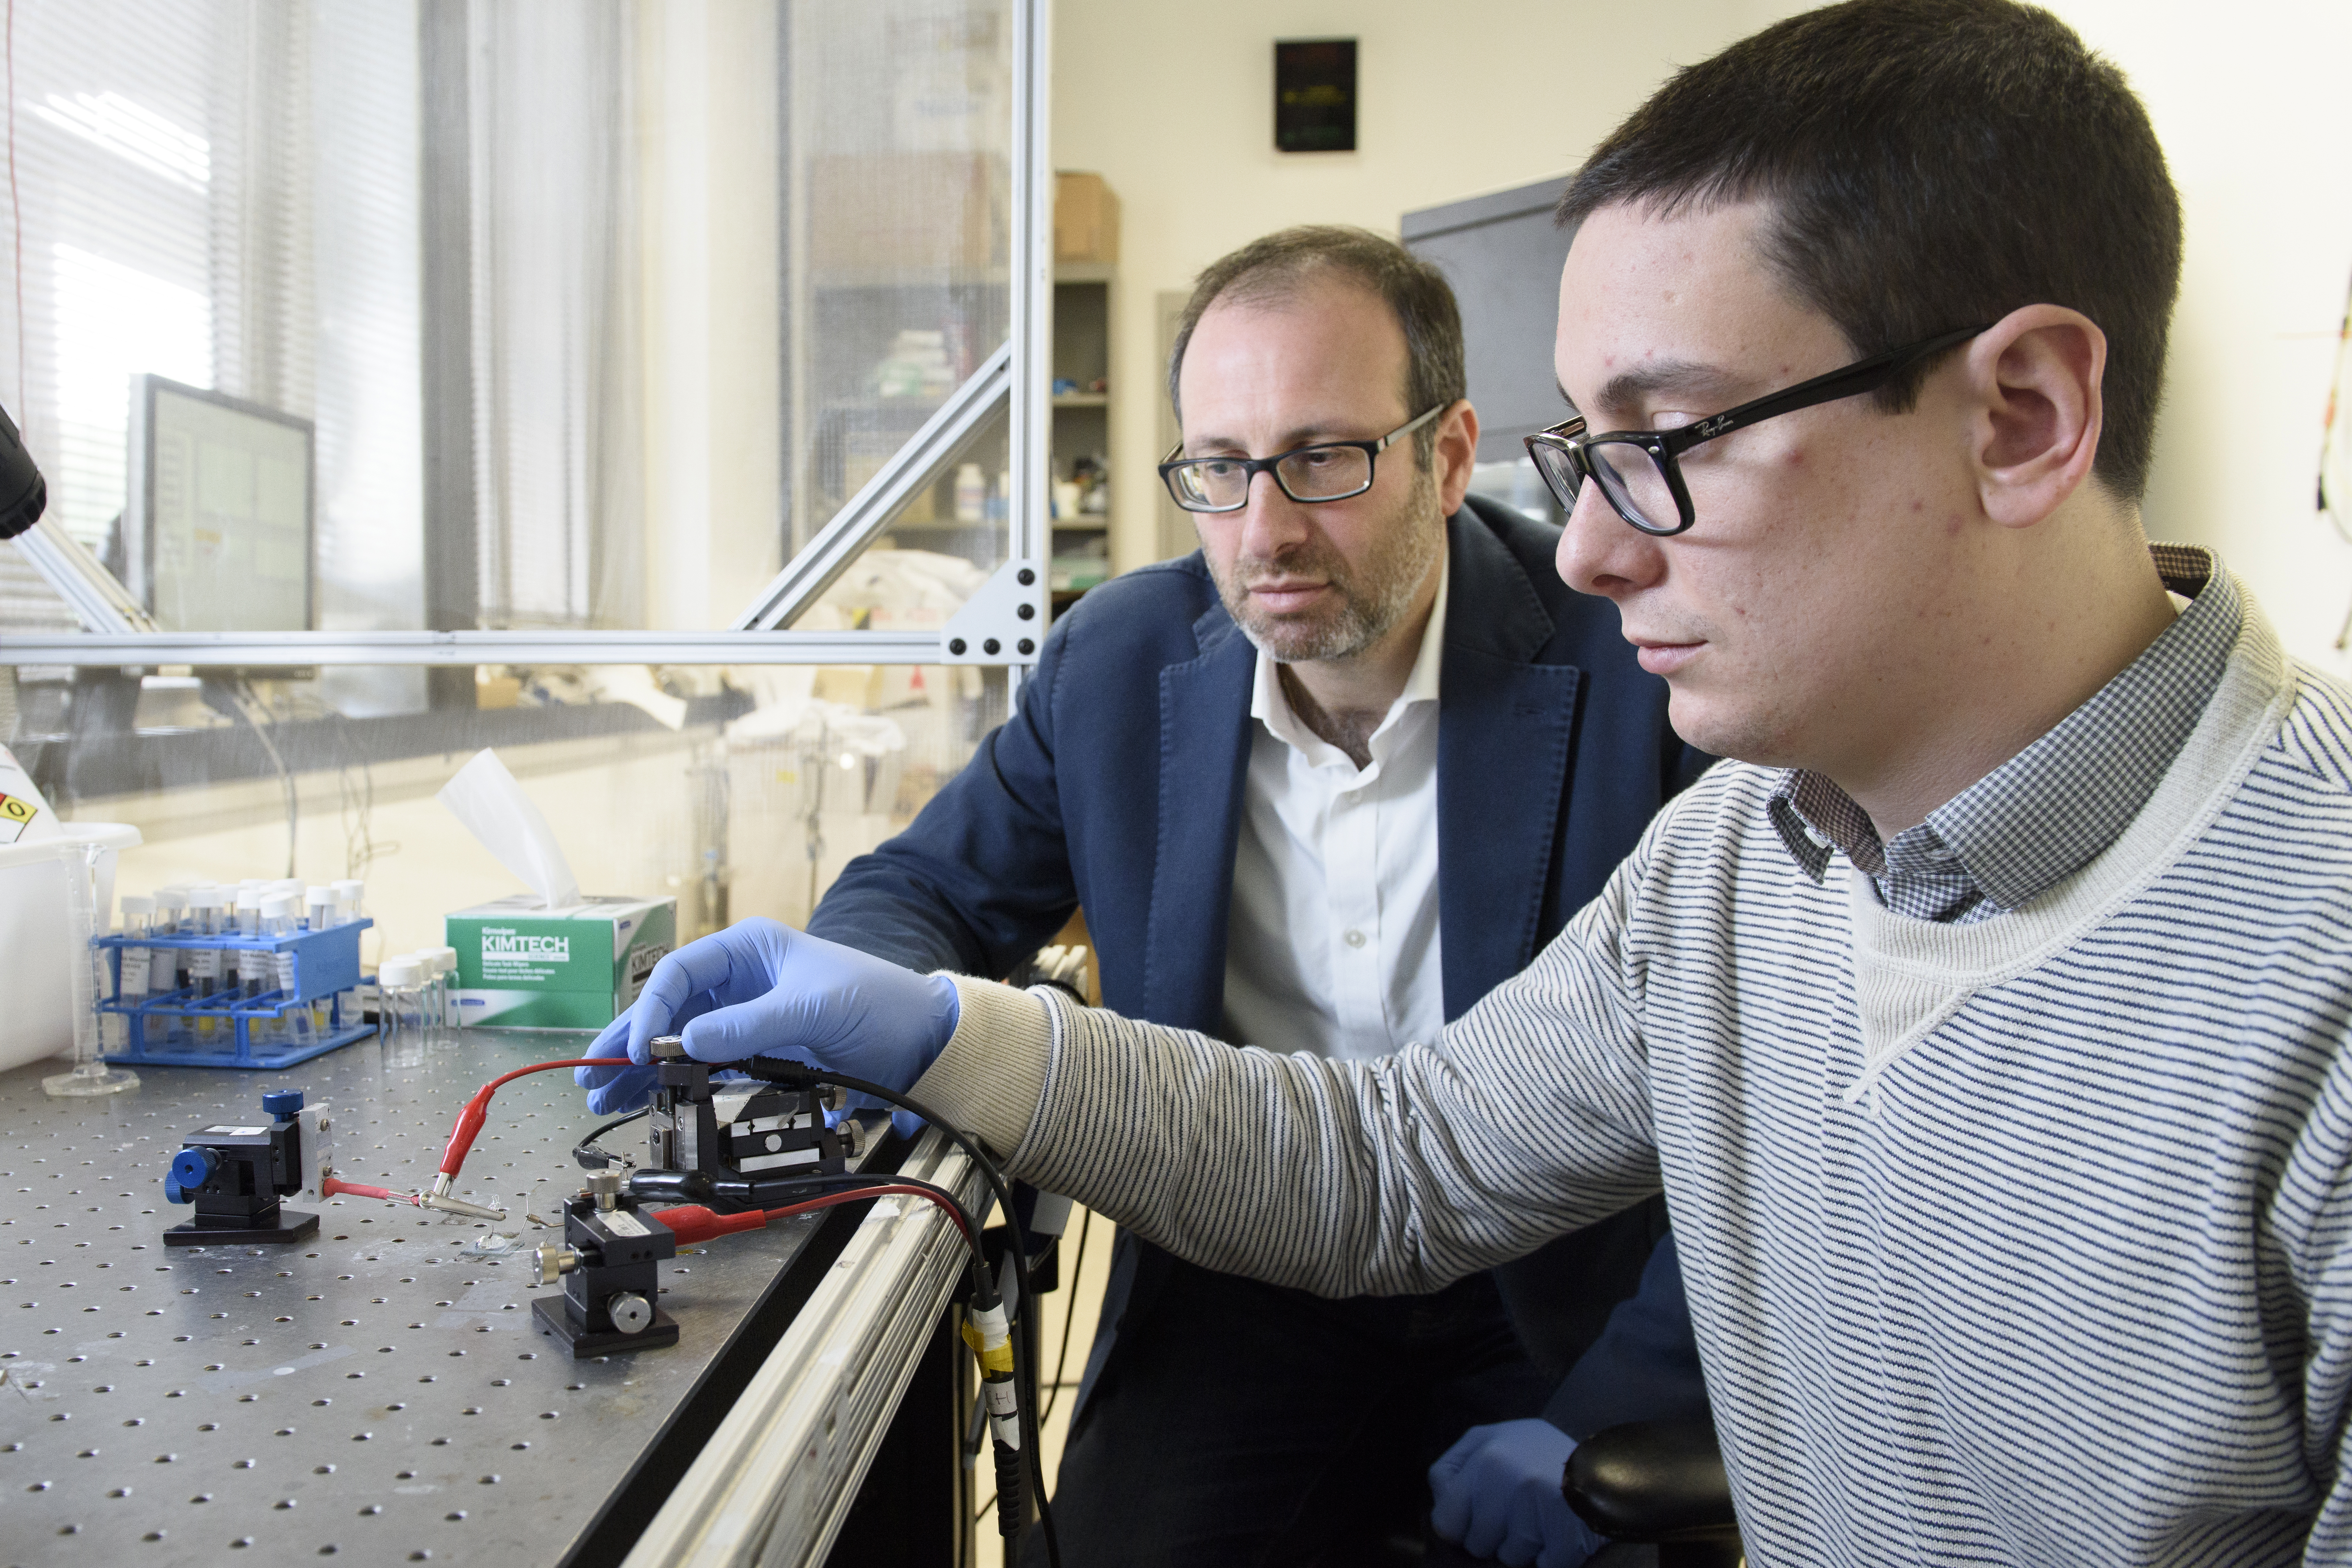 Prof. Alberto Salleo and graduate student Scott Keene in the lab